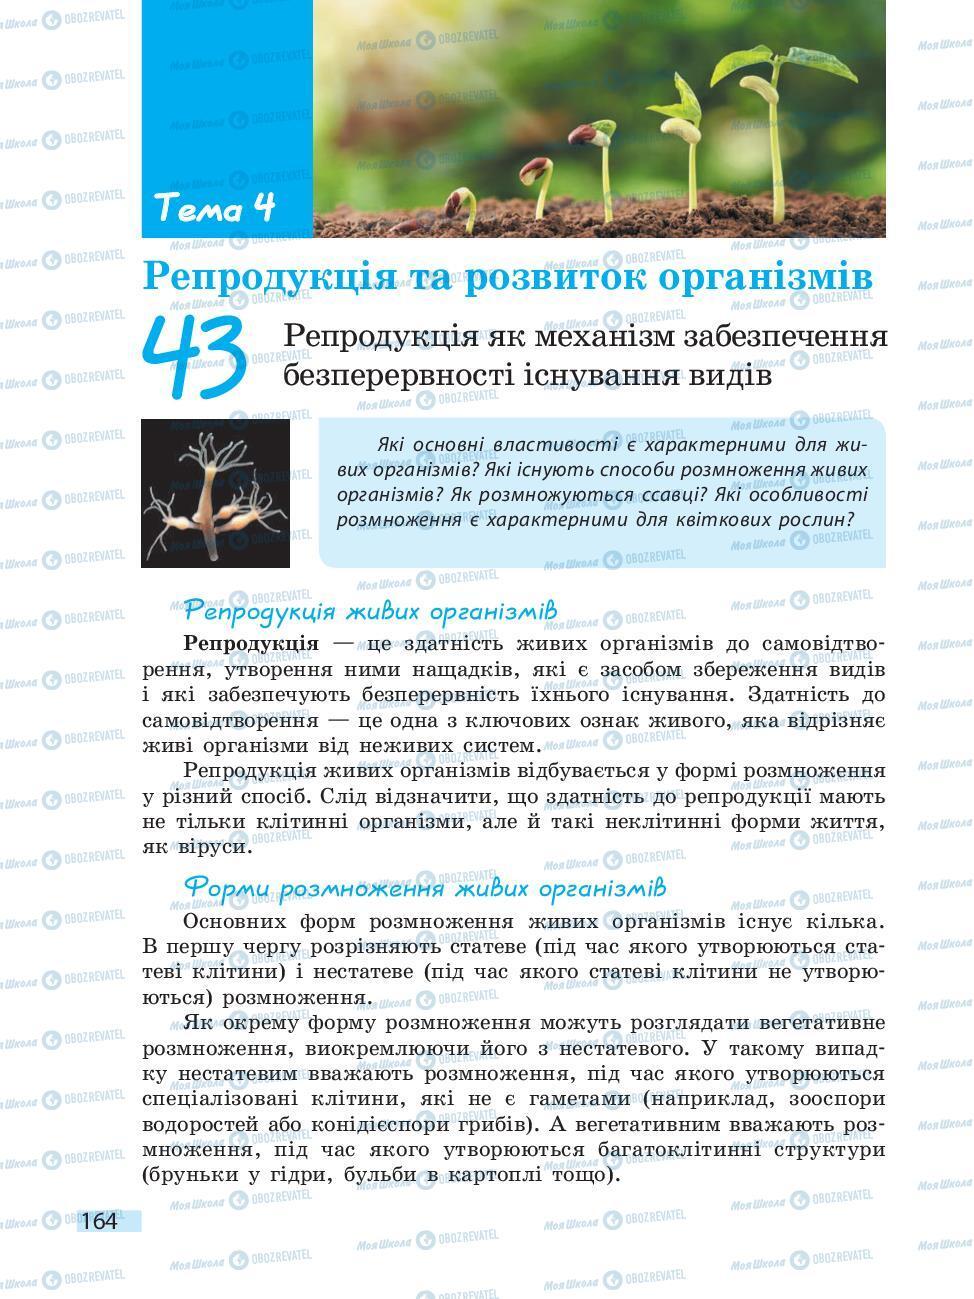 Учебники Биология 10 класс страница 164